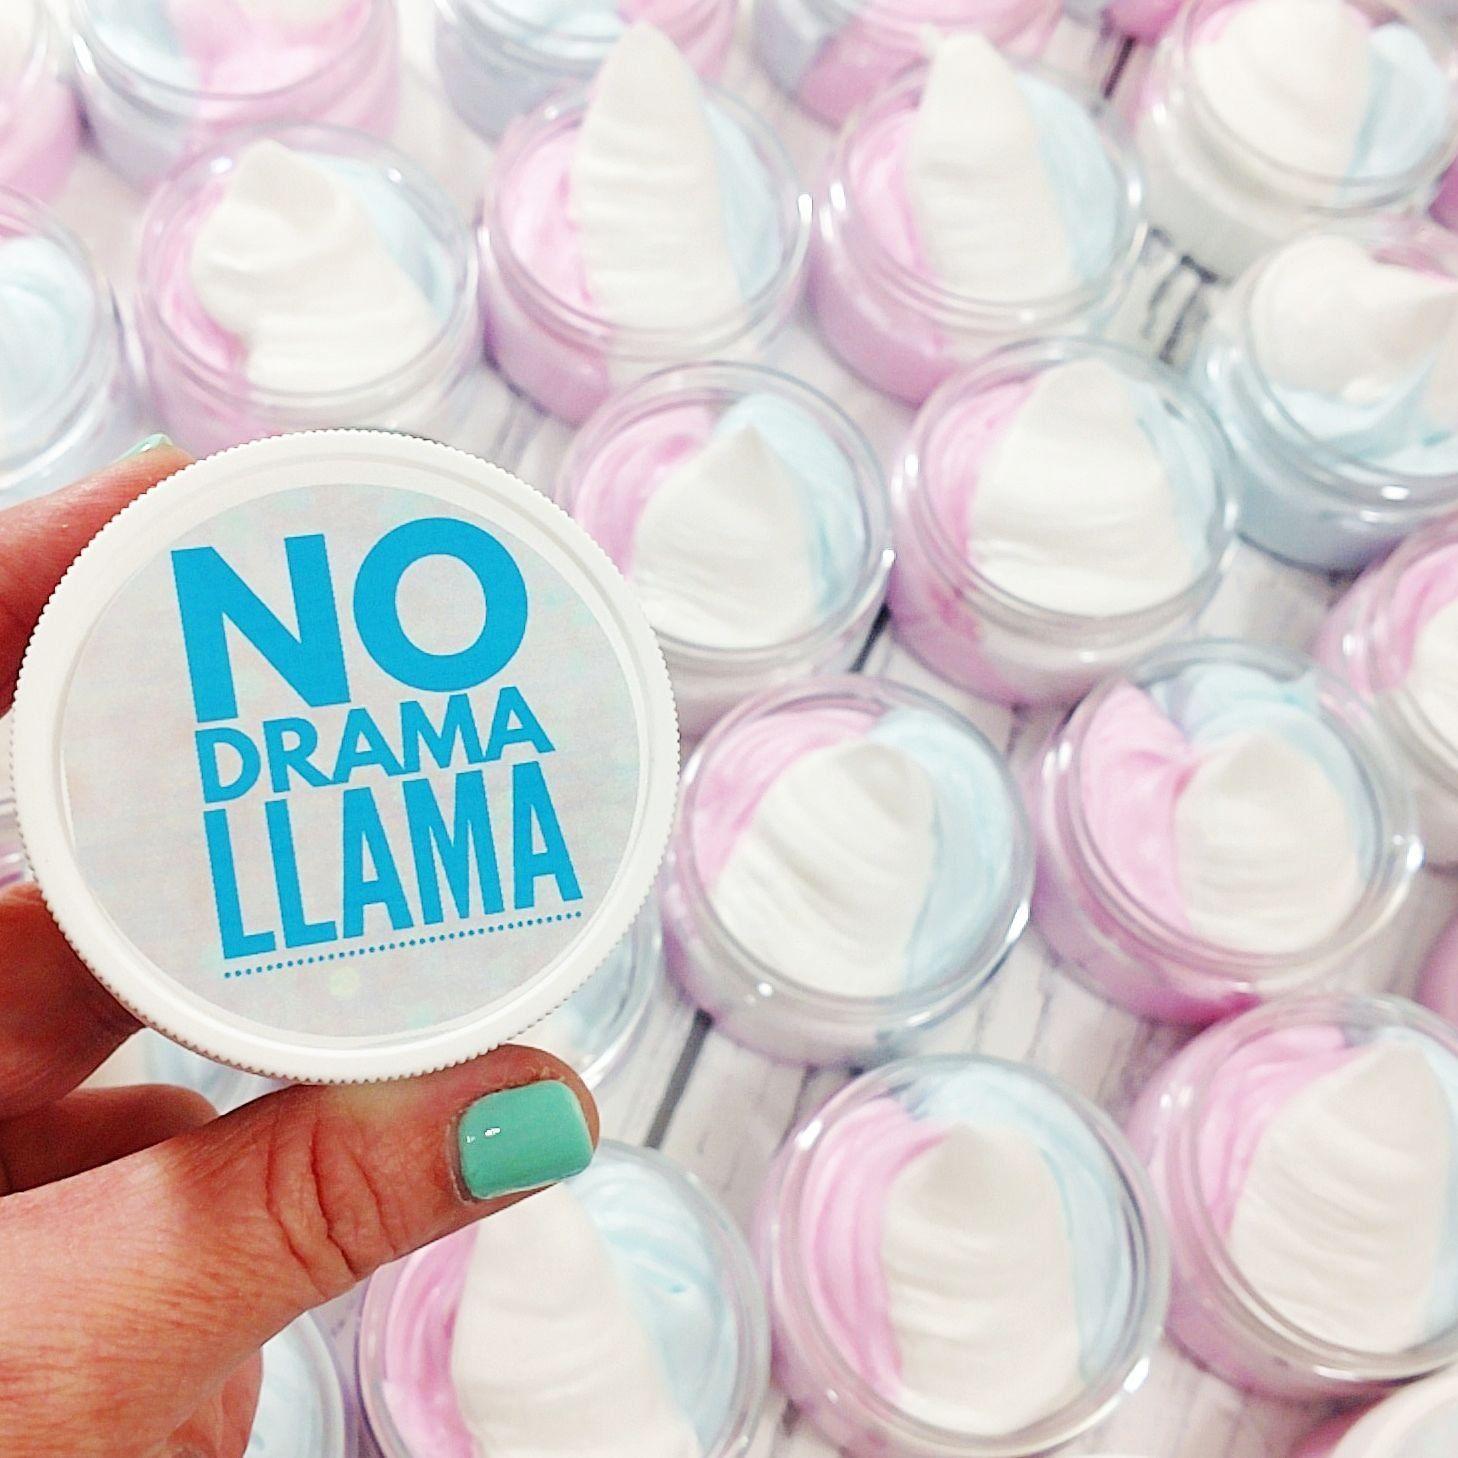 No Drama Llama Whipped Body Butter Lotion Vanilla Birthday Cake Scent Mama Handmade